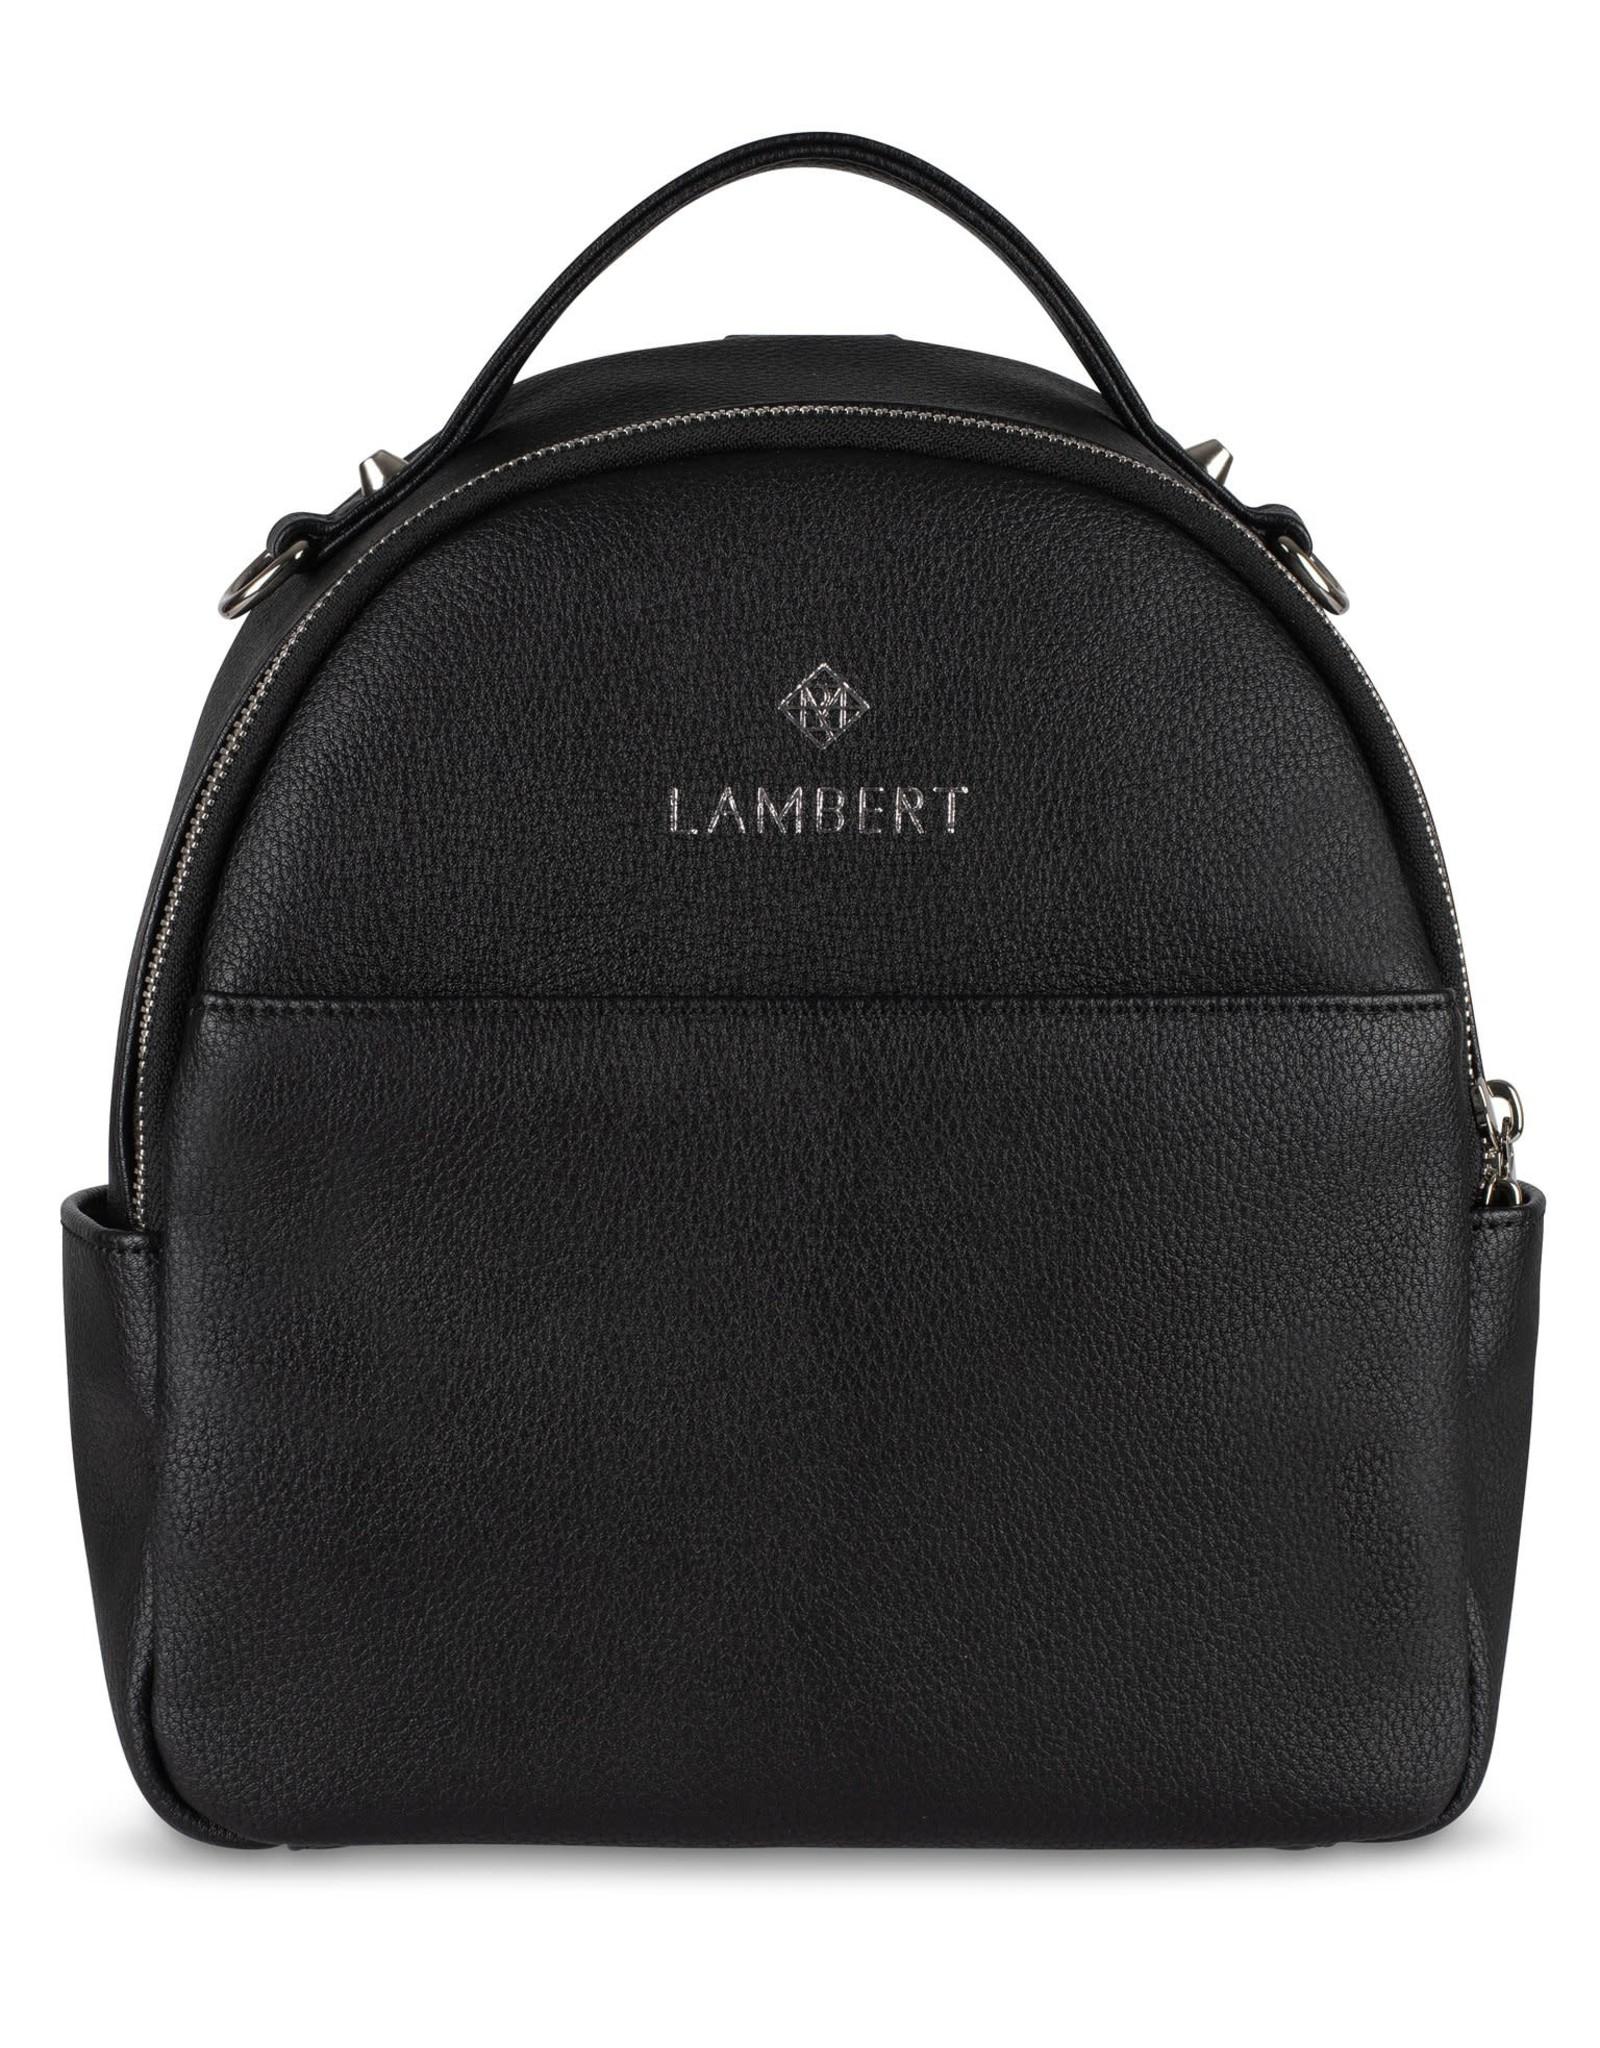 Lambert Mini Sac à Dos en Cuir Vegan Lambert Charlie